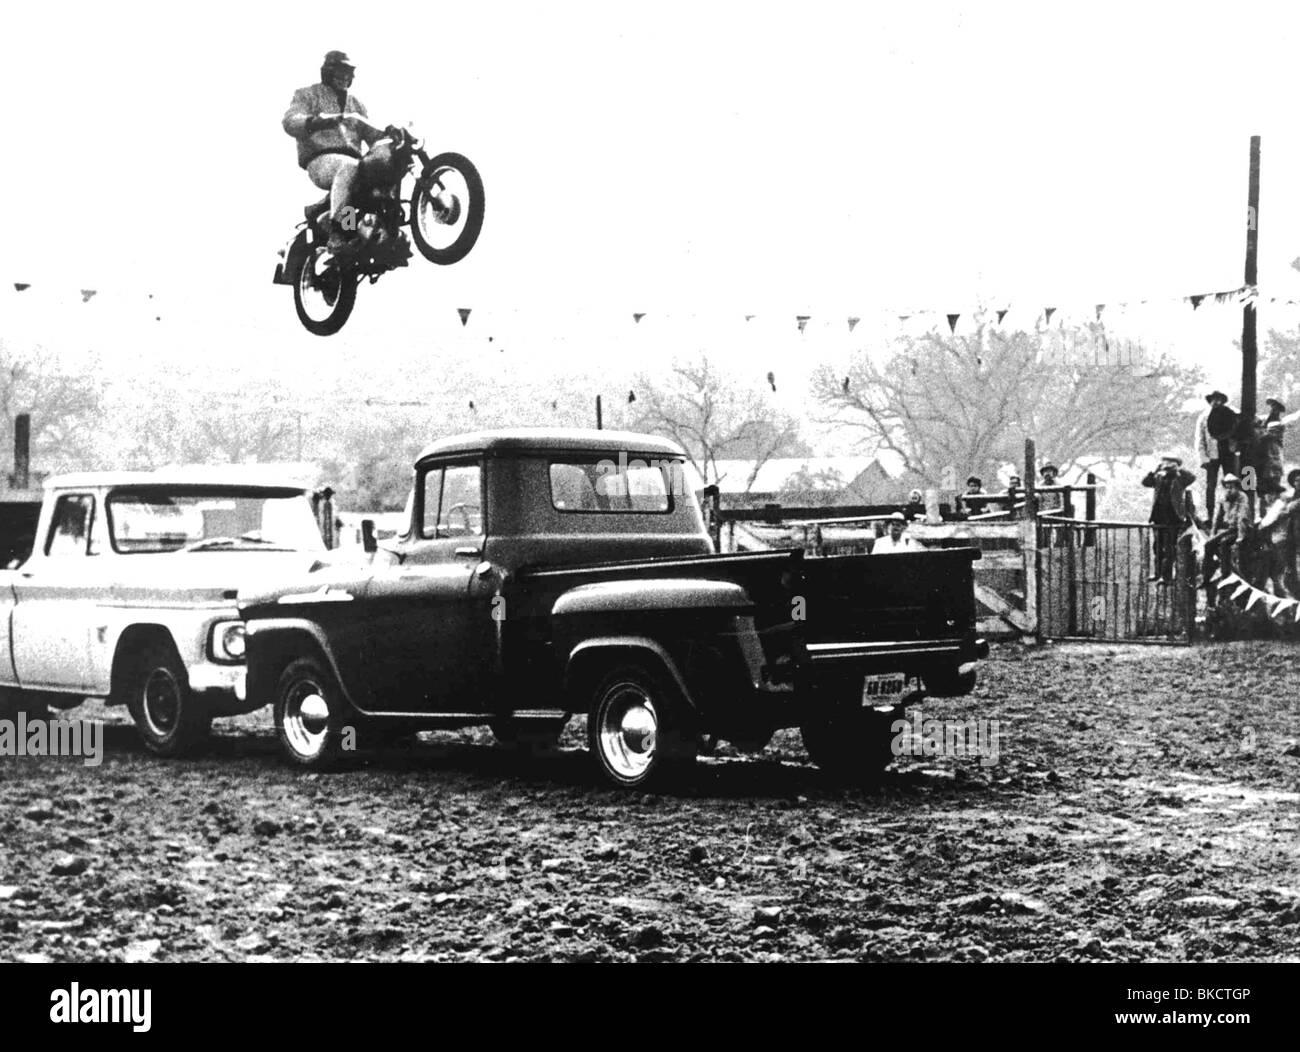 EVEL KNIEVEL (1971) MARVIN CHOMSKY (DIR) EVLK 002P - Stock Image